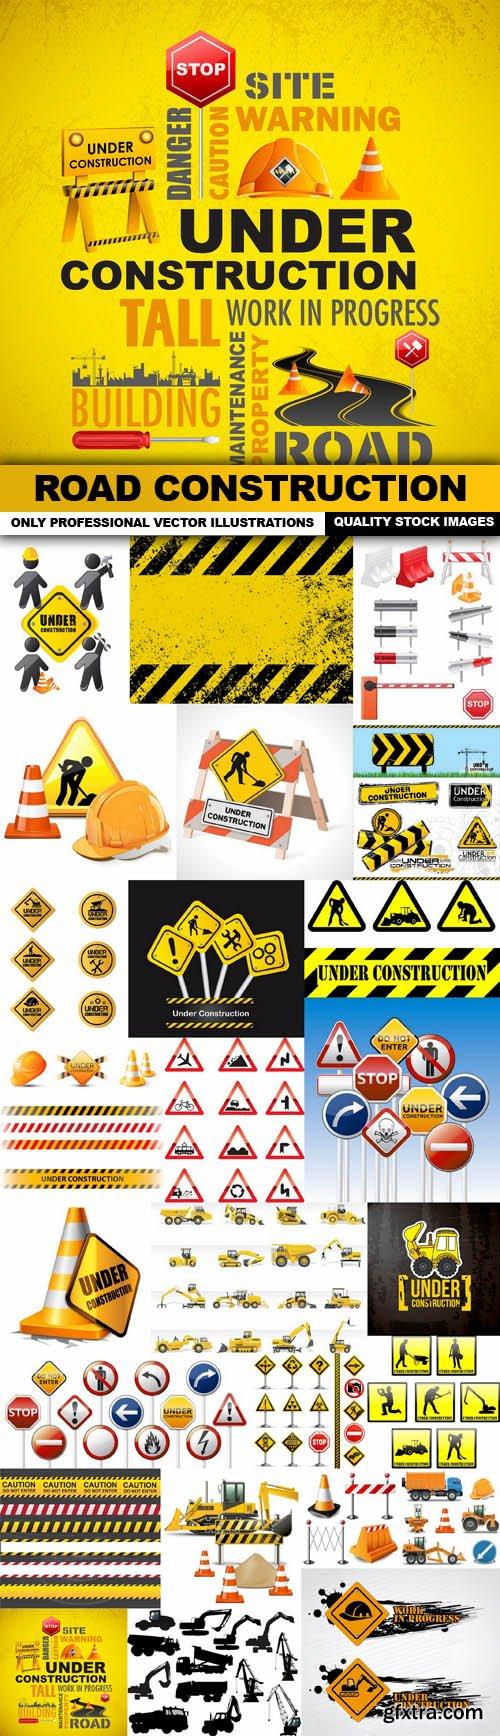 Road Construction - 25 Vector